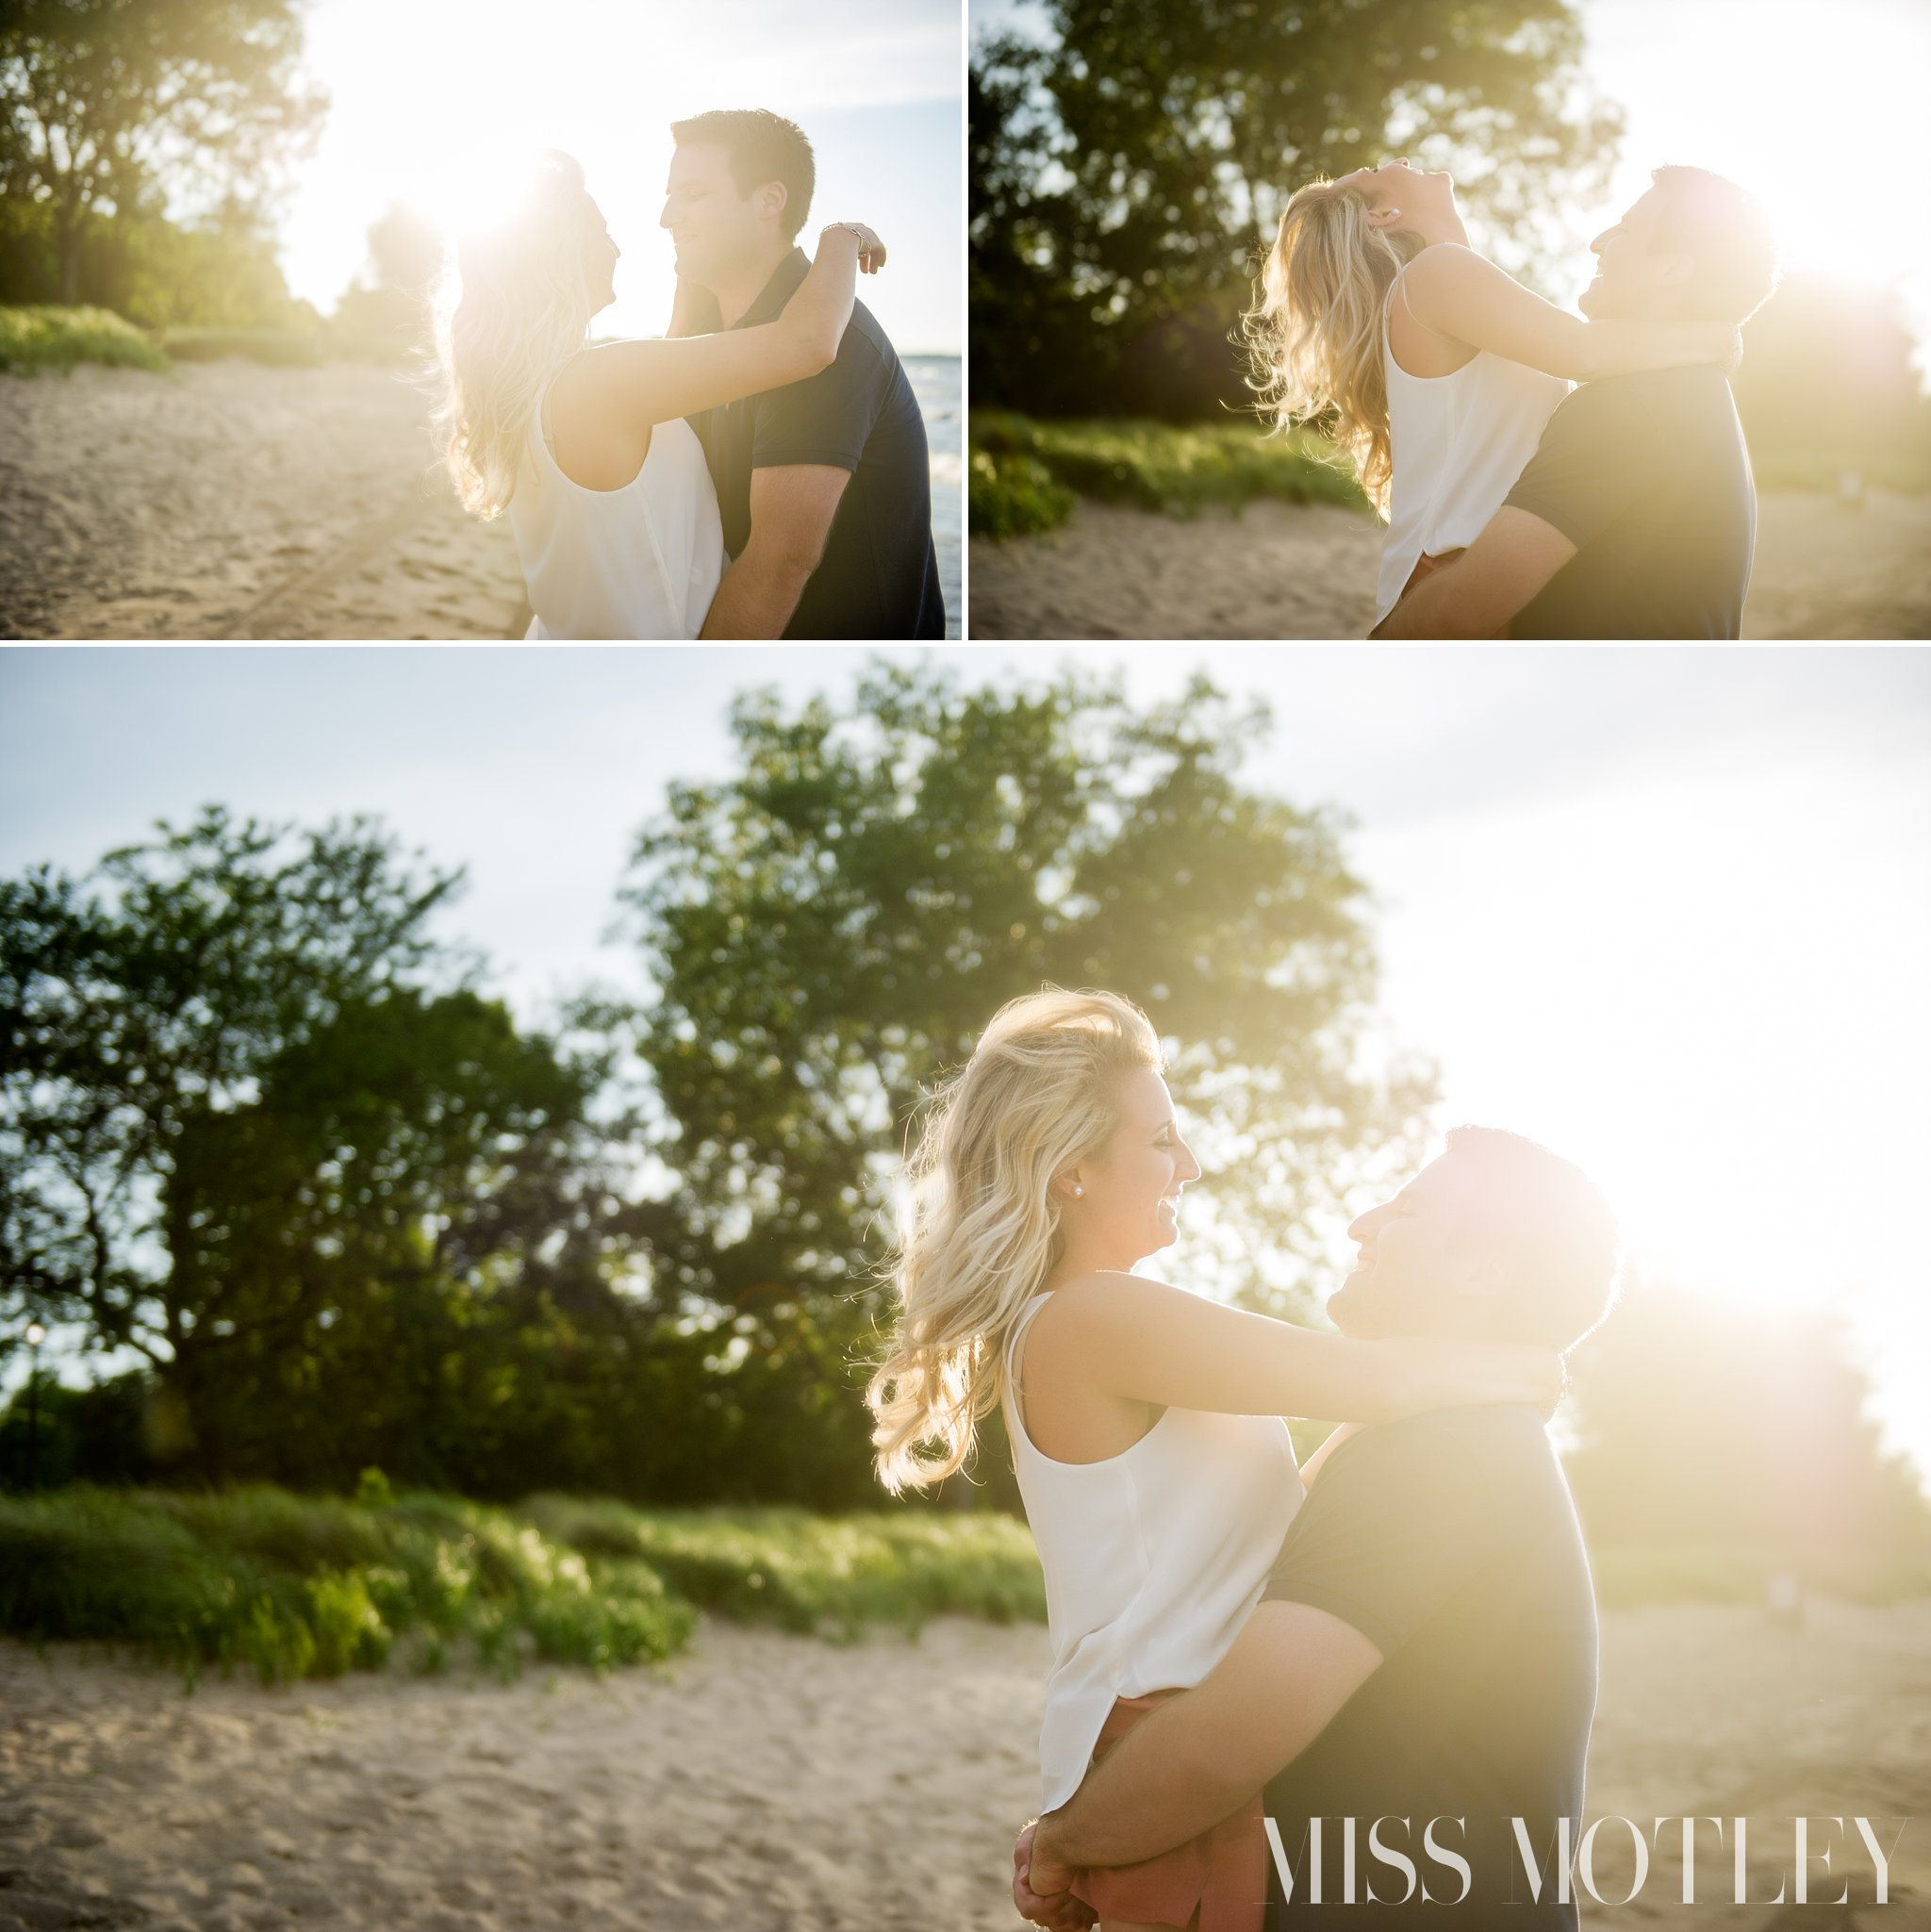 miss_motley_photography_0387.jpg